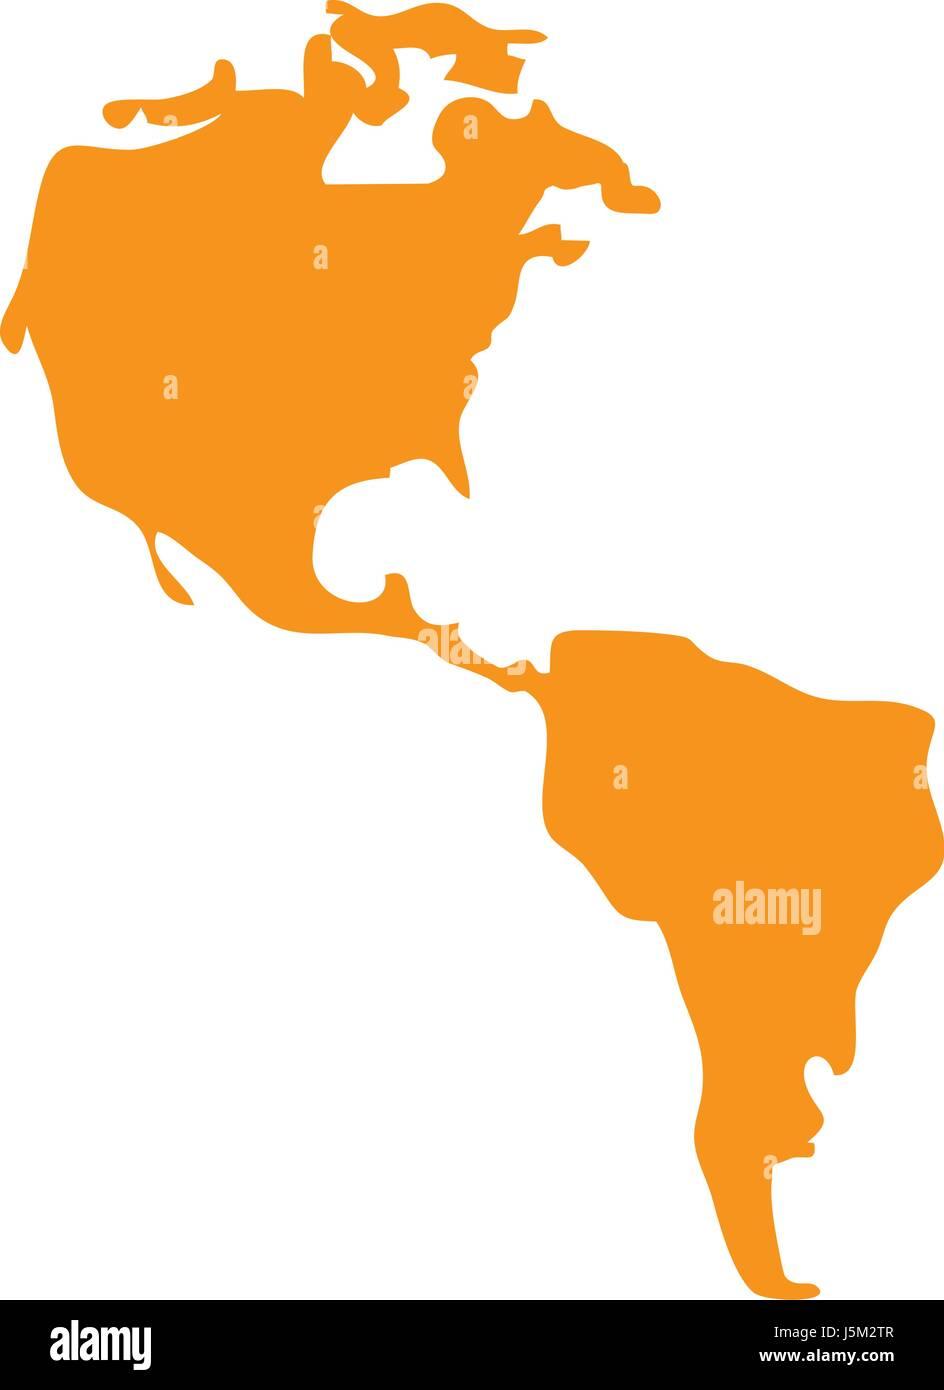 America map icon stock vector art illustration vector image america map icon sciox Choice Image